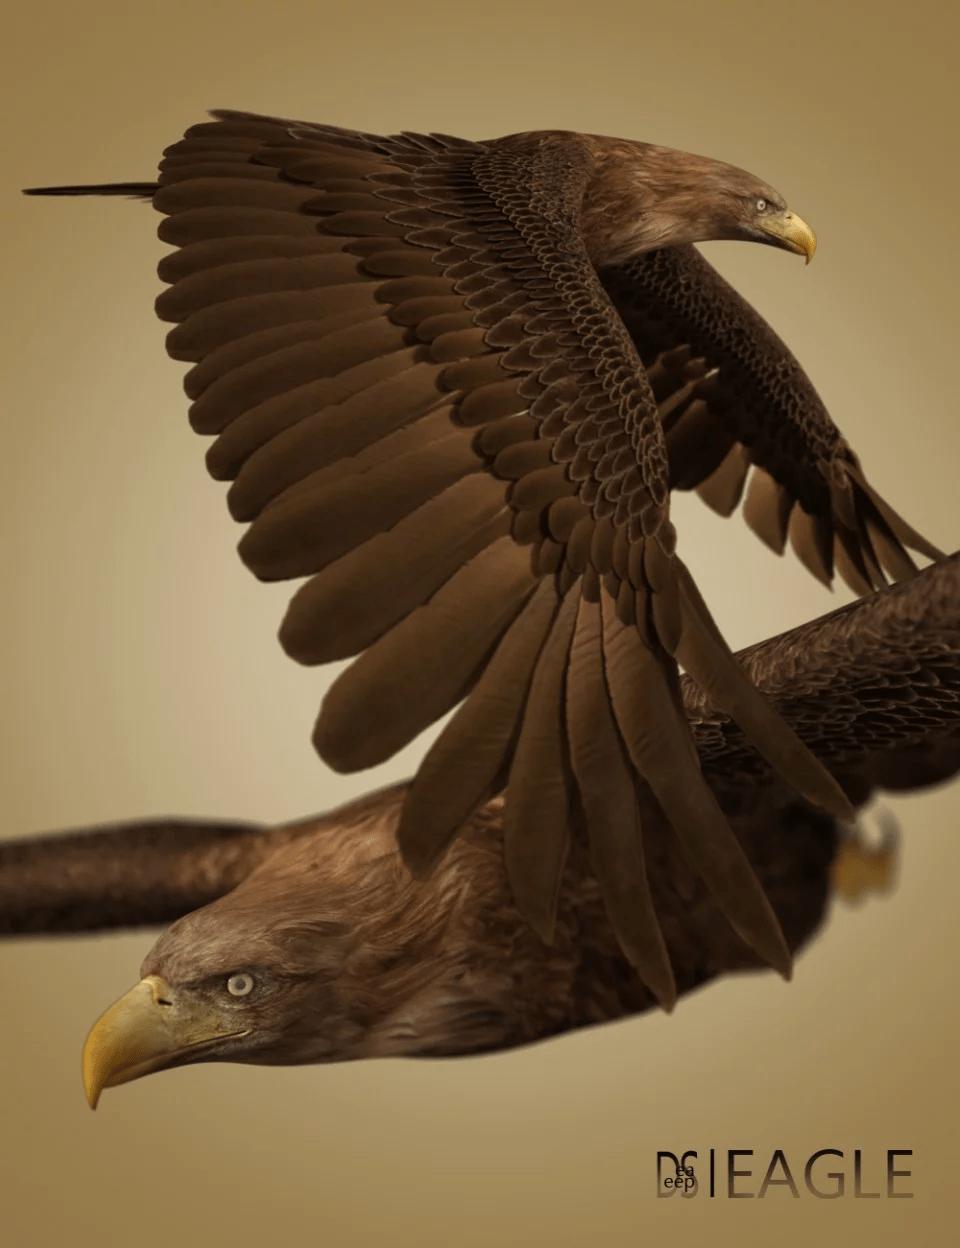 deepsea's-eagle-aniblocks-and-texture-add-on